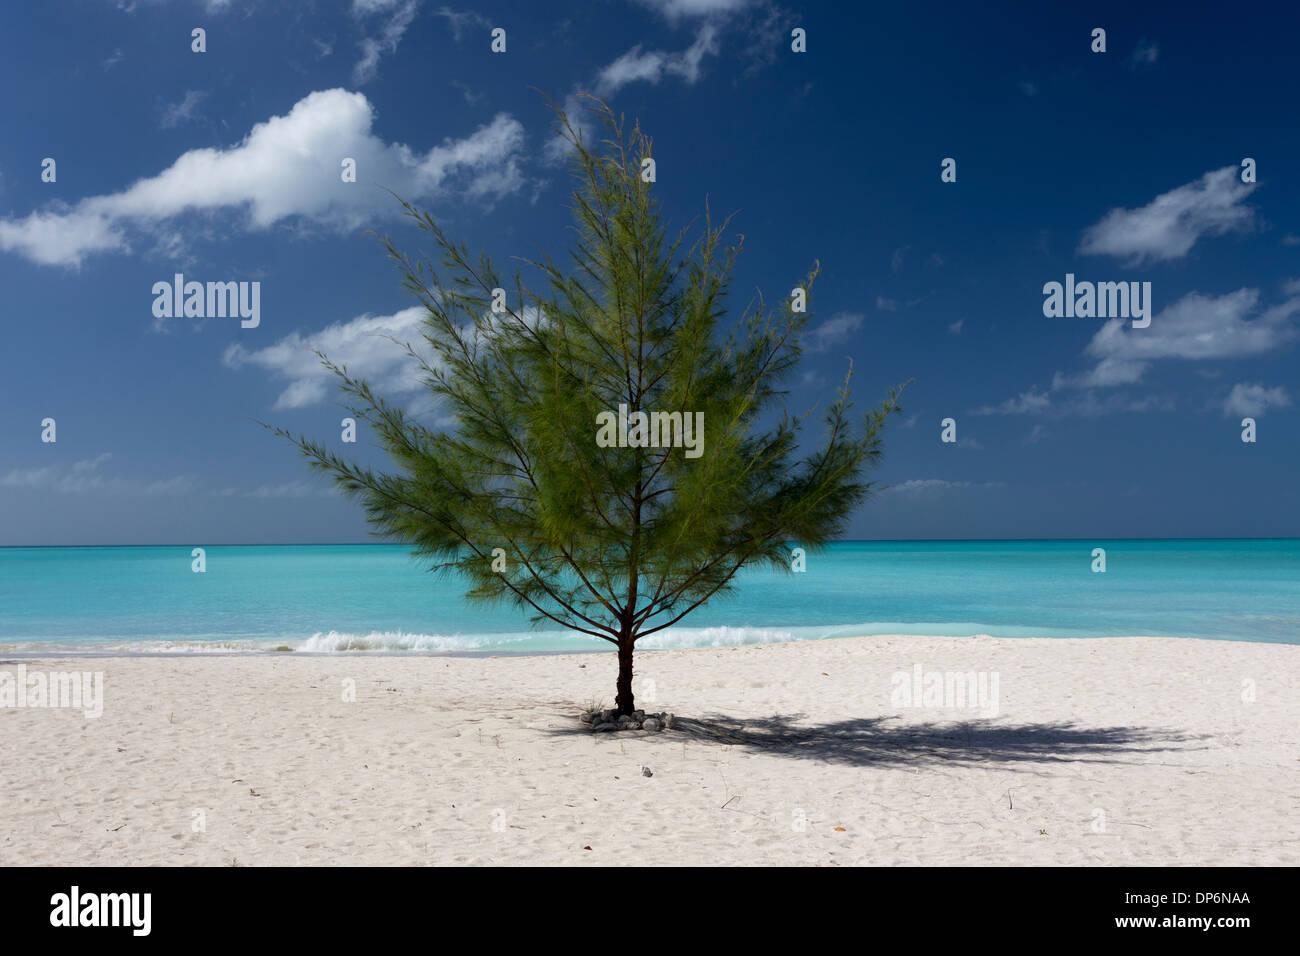 Lone tree on Jolly Beach, Antigua, Leeward Islands West Indies - Stock Image